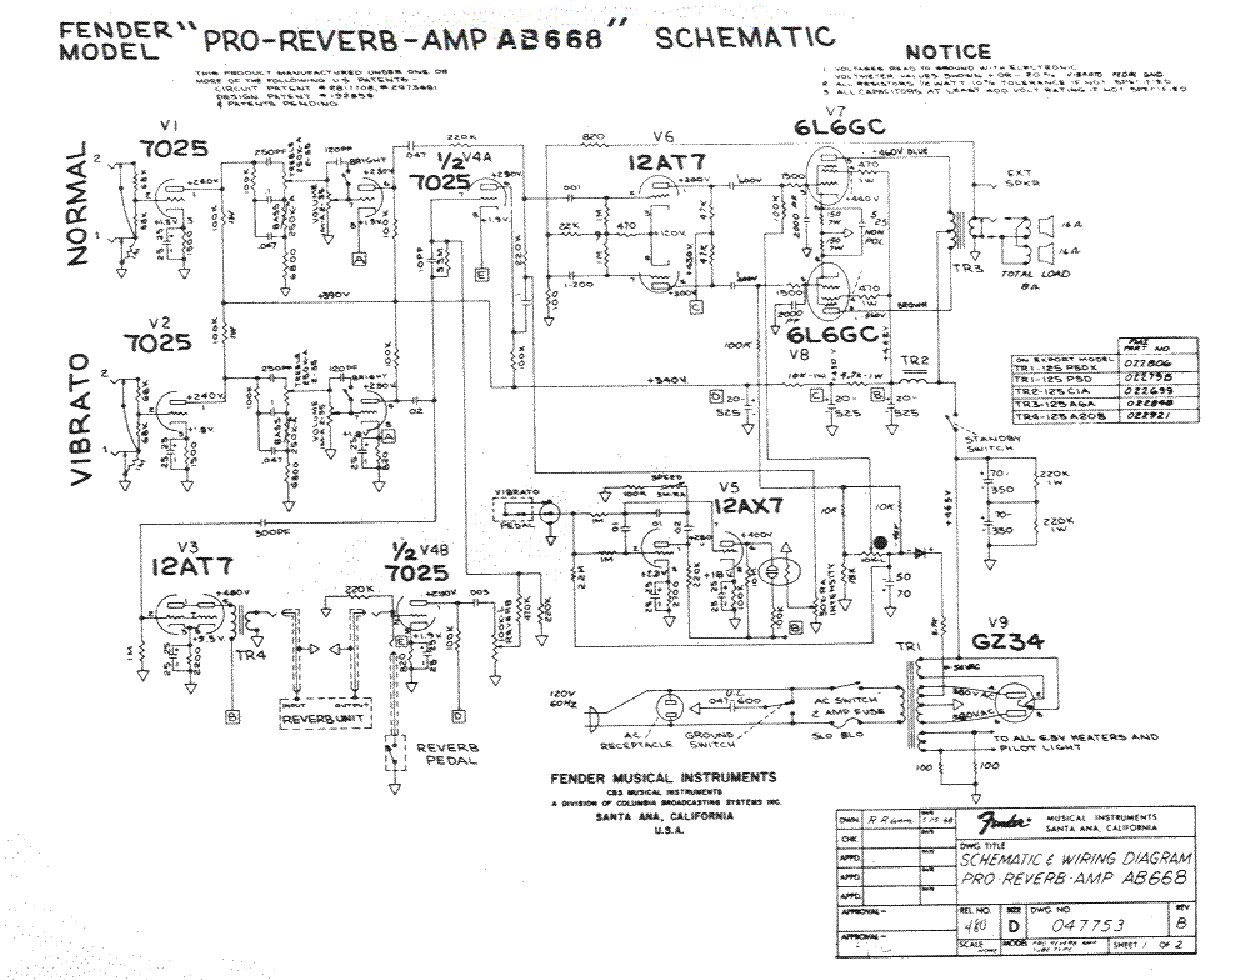 FENDER PRO-REVERB-AB668 Service Manual download, schematics ... on fender vibroverb schematic, fender musicmaster schematic, fender vibrolux schematic, fender frontman 25r schematic, fender blues deluxe schematic, fender amp manuals, fender champ schematic explained, fender harvard schematic, fender concert schematic, fender twin schematic, fender twin reverb tube layout, fender princeton schematic, fender bantam bass schematic, fender hot rod deluxe schematic, fender vibro champ schematic, fender excelsior schematic, fender champion 600 schematic, fender amp schematic, fender reverb amp,